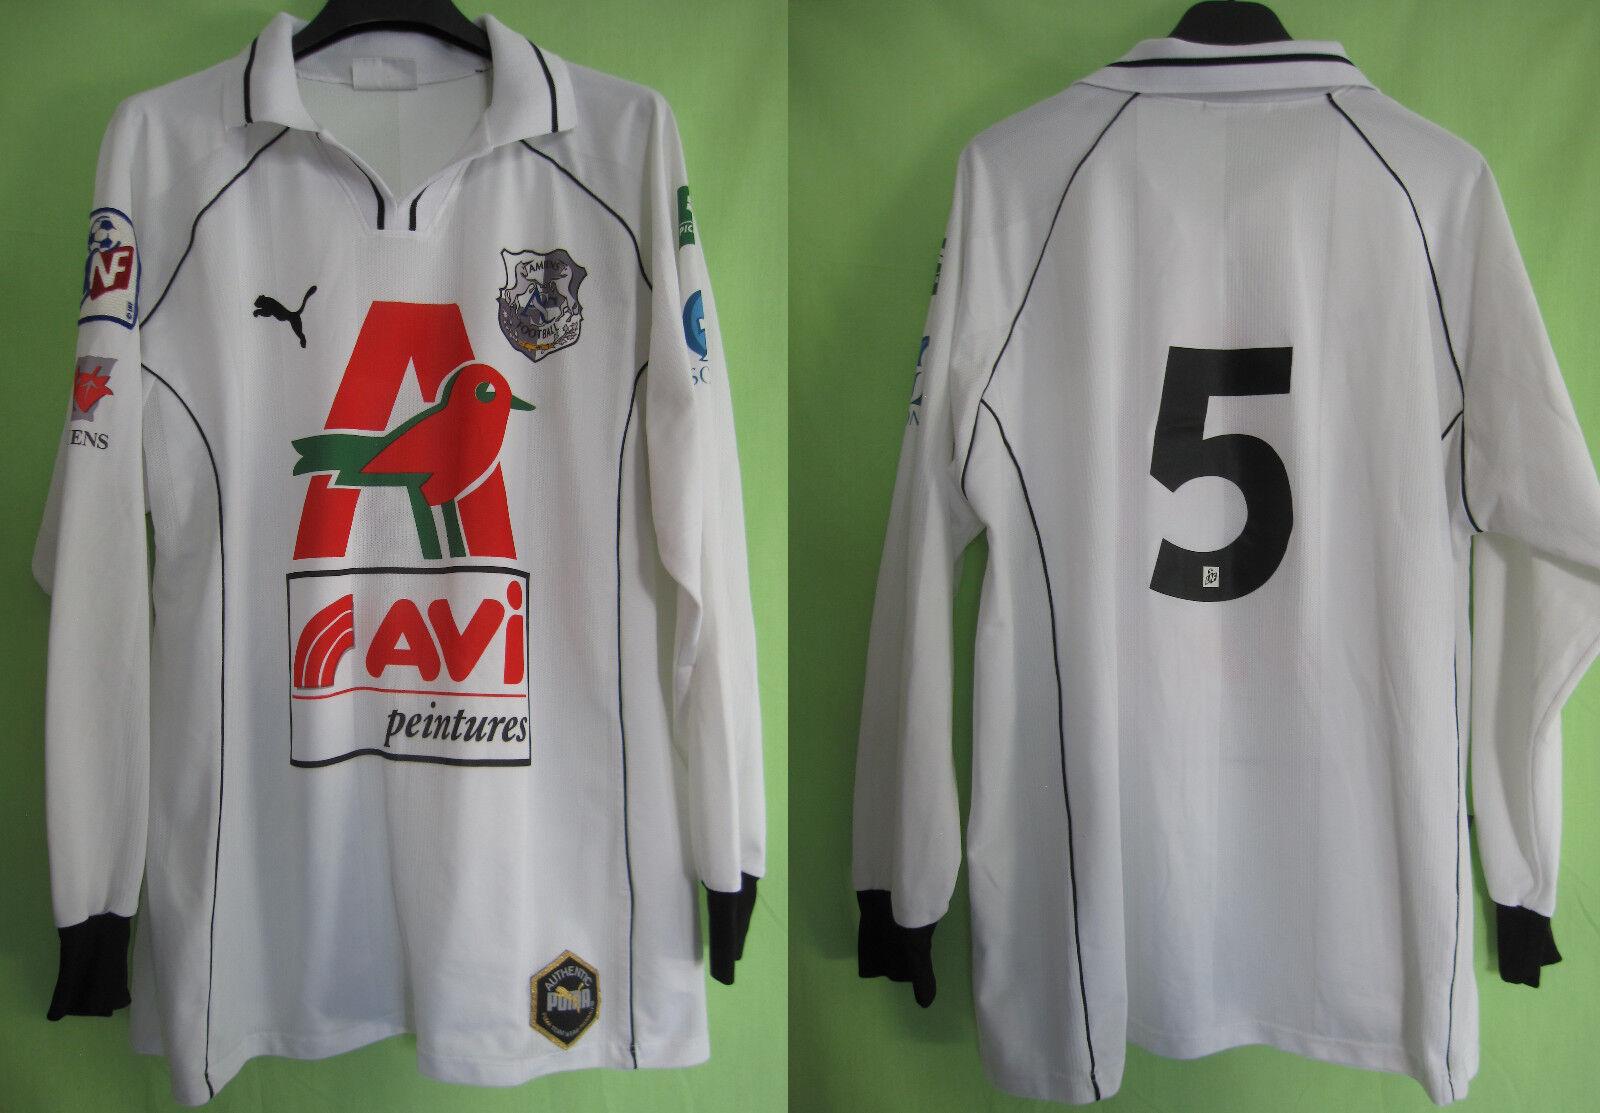 Maillot AMIENS ASC porté  5 Puma match worn shirt Auchan Avi Vintage  XL